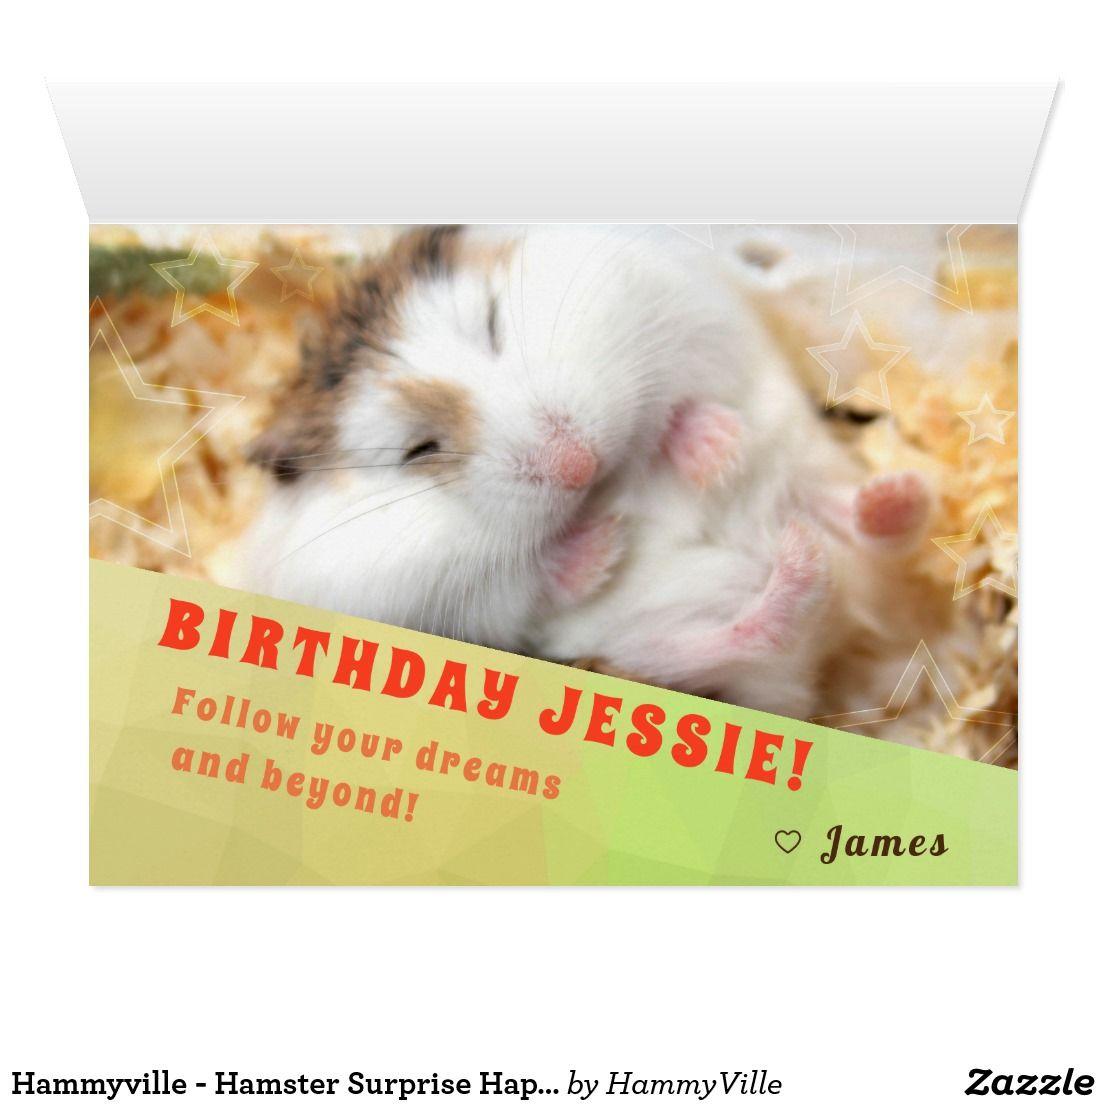 Hammyville Hamster Surprise Happy Birthday Card Zazzle Com Happy Birthday Cards Happy Birthday Cards Diy Hamster